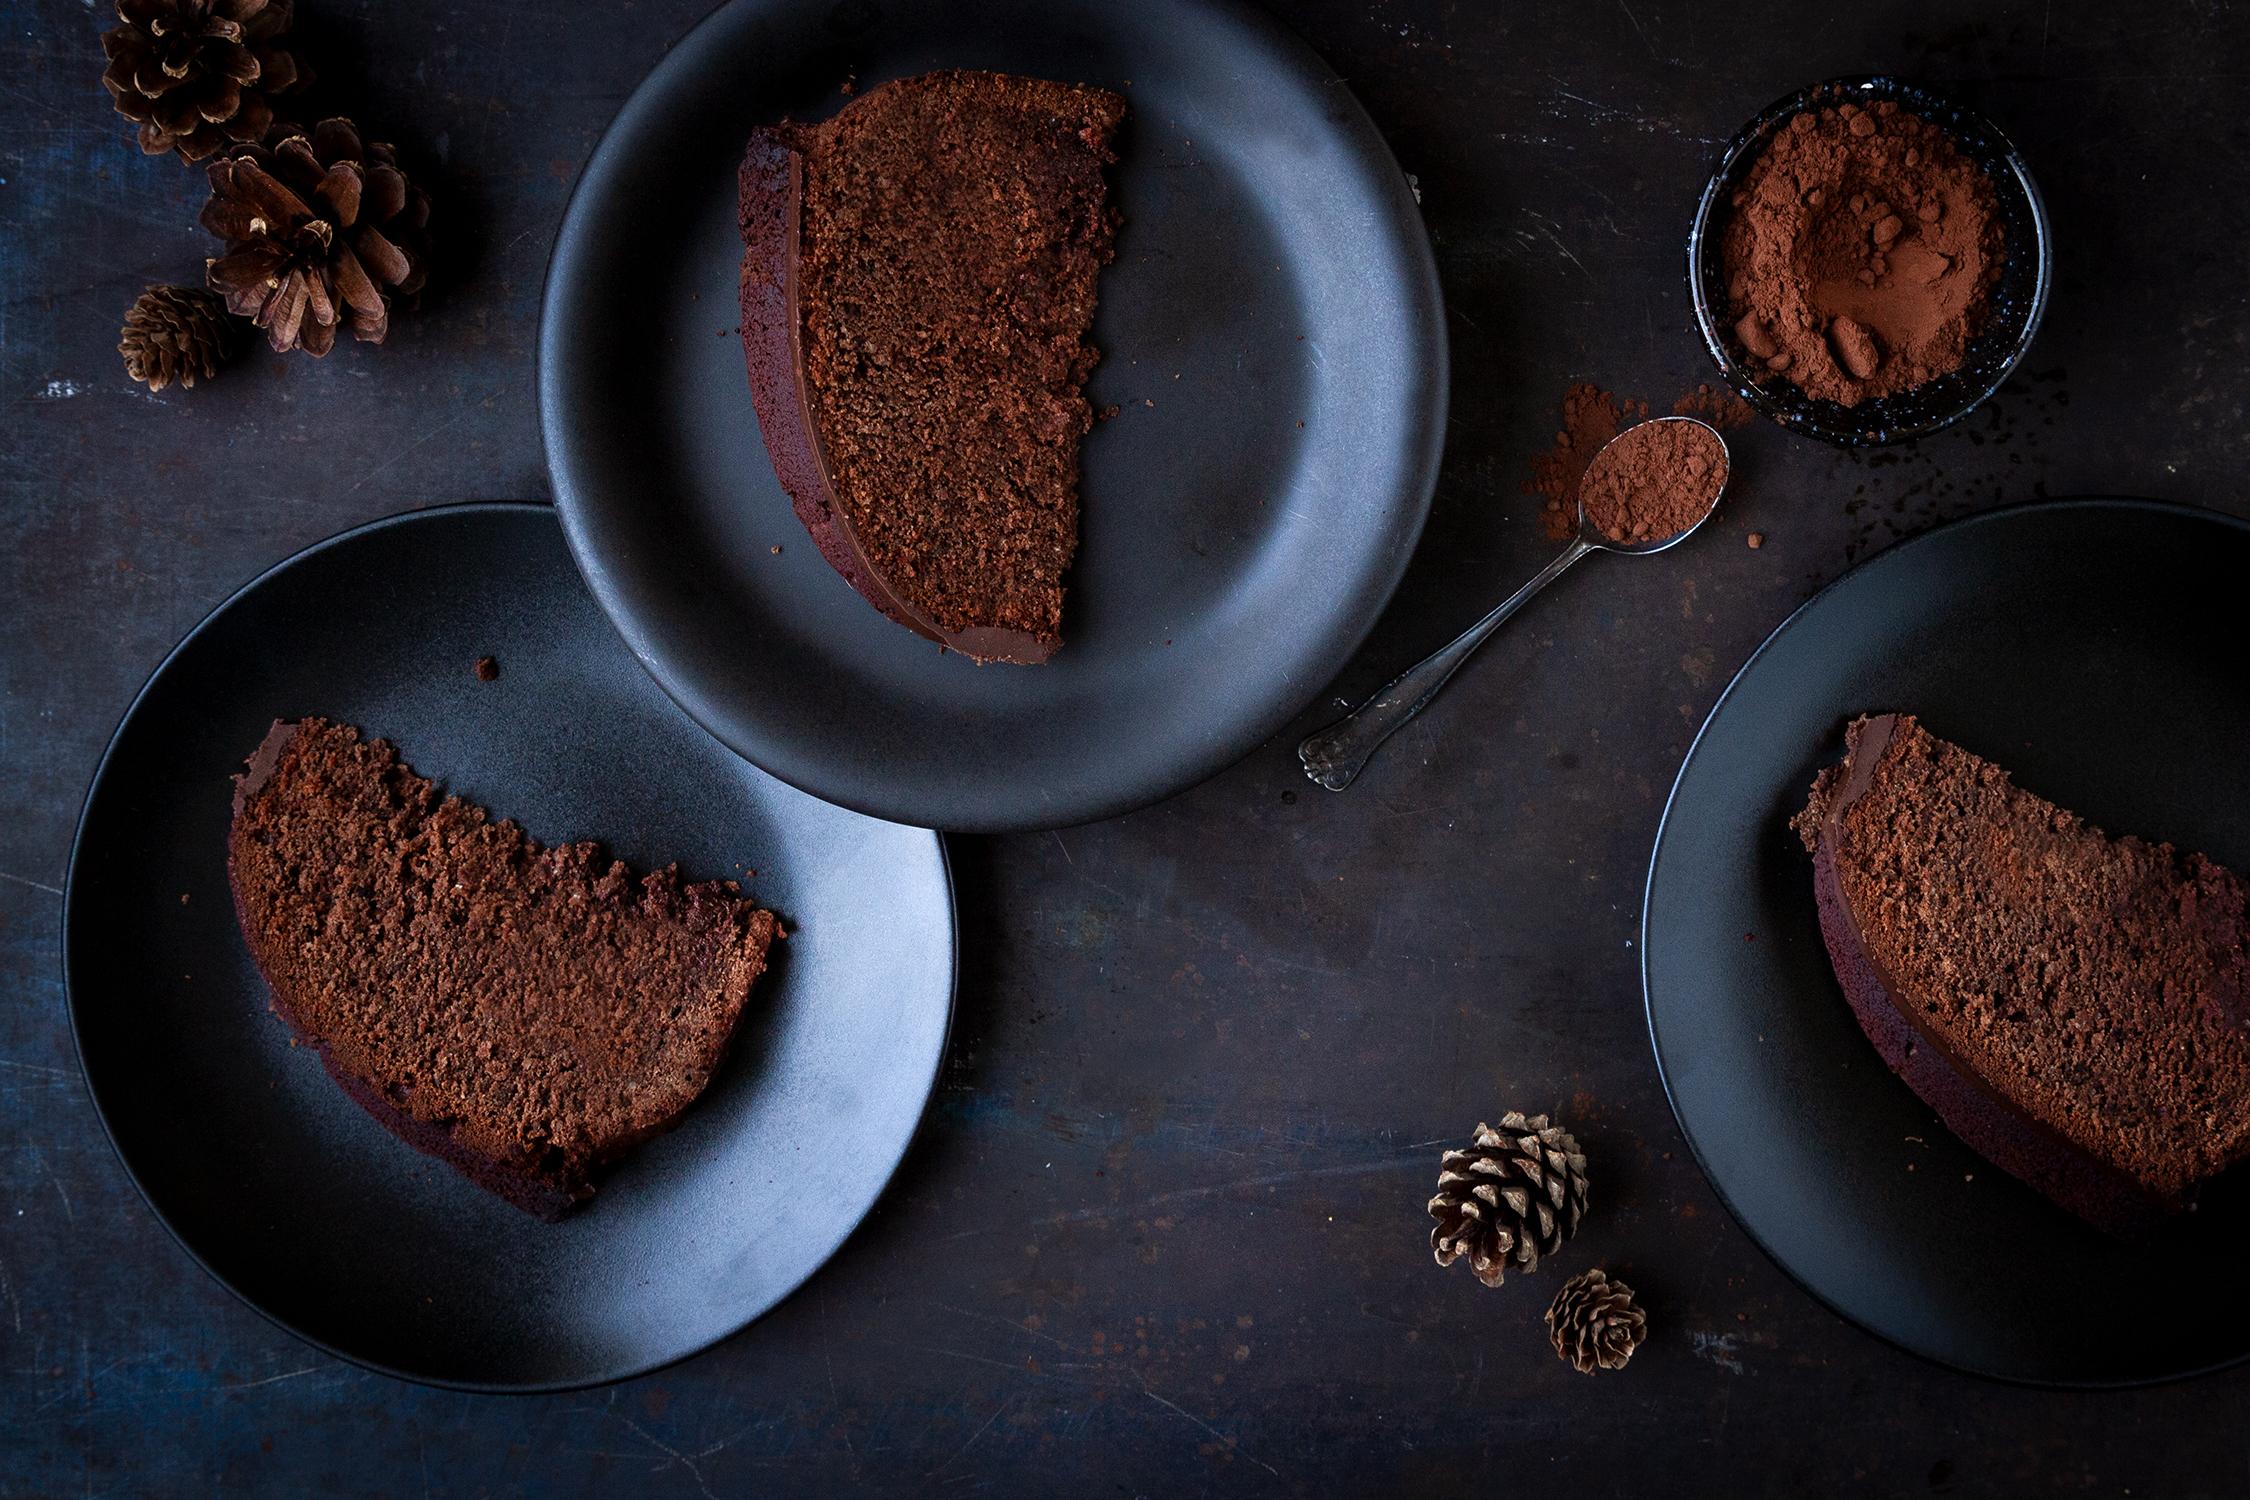 04_NOMNOM_Lebkuchen-Schokolade-Gugelhupf.jpg